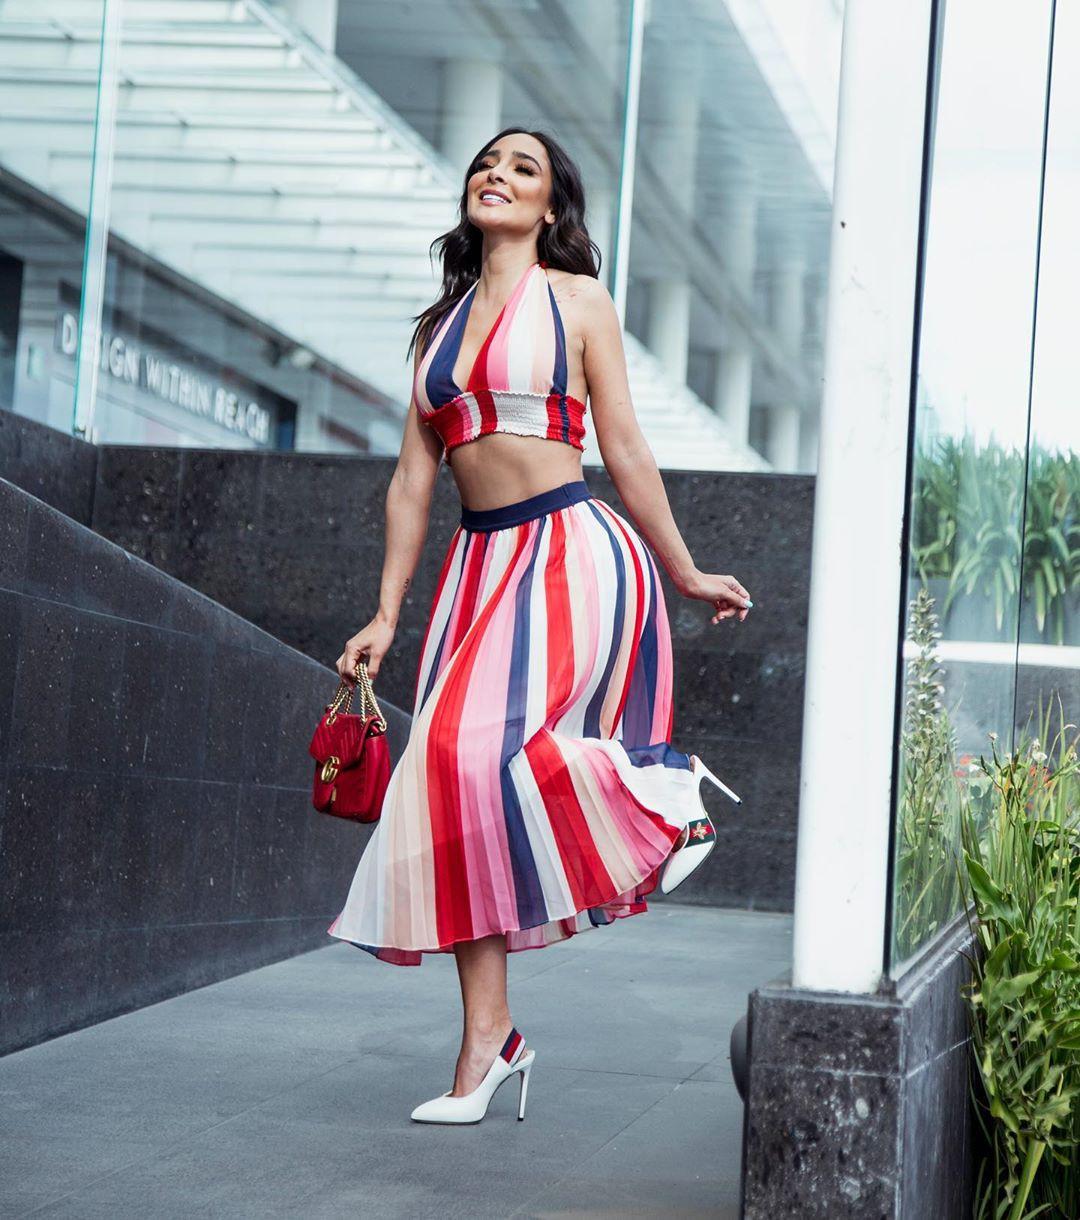 Manelyk Gonzalez dress crop top matching dress, fashion photoshoot